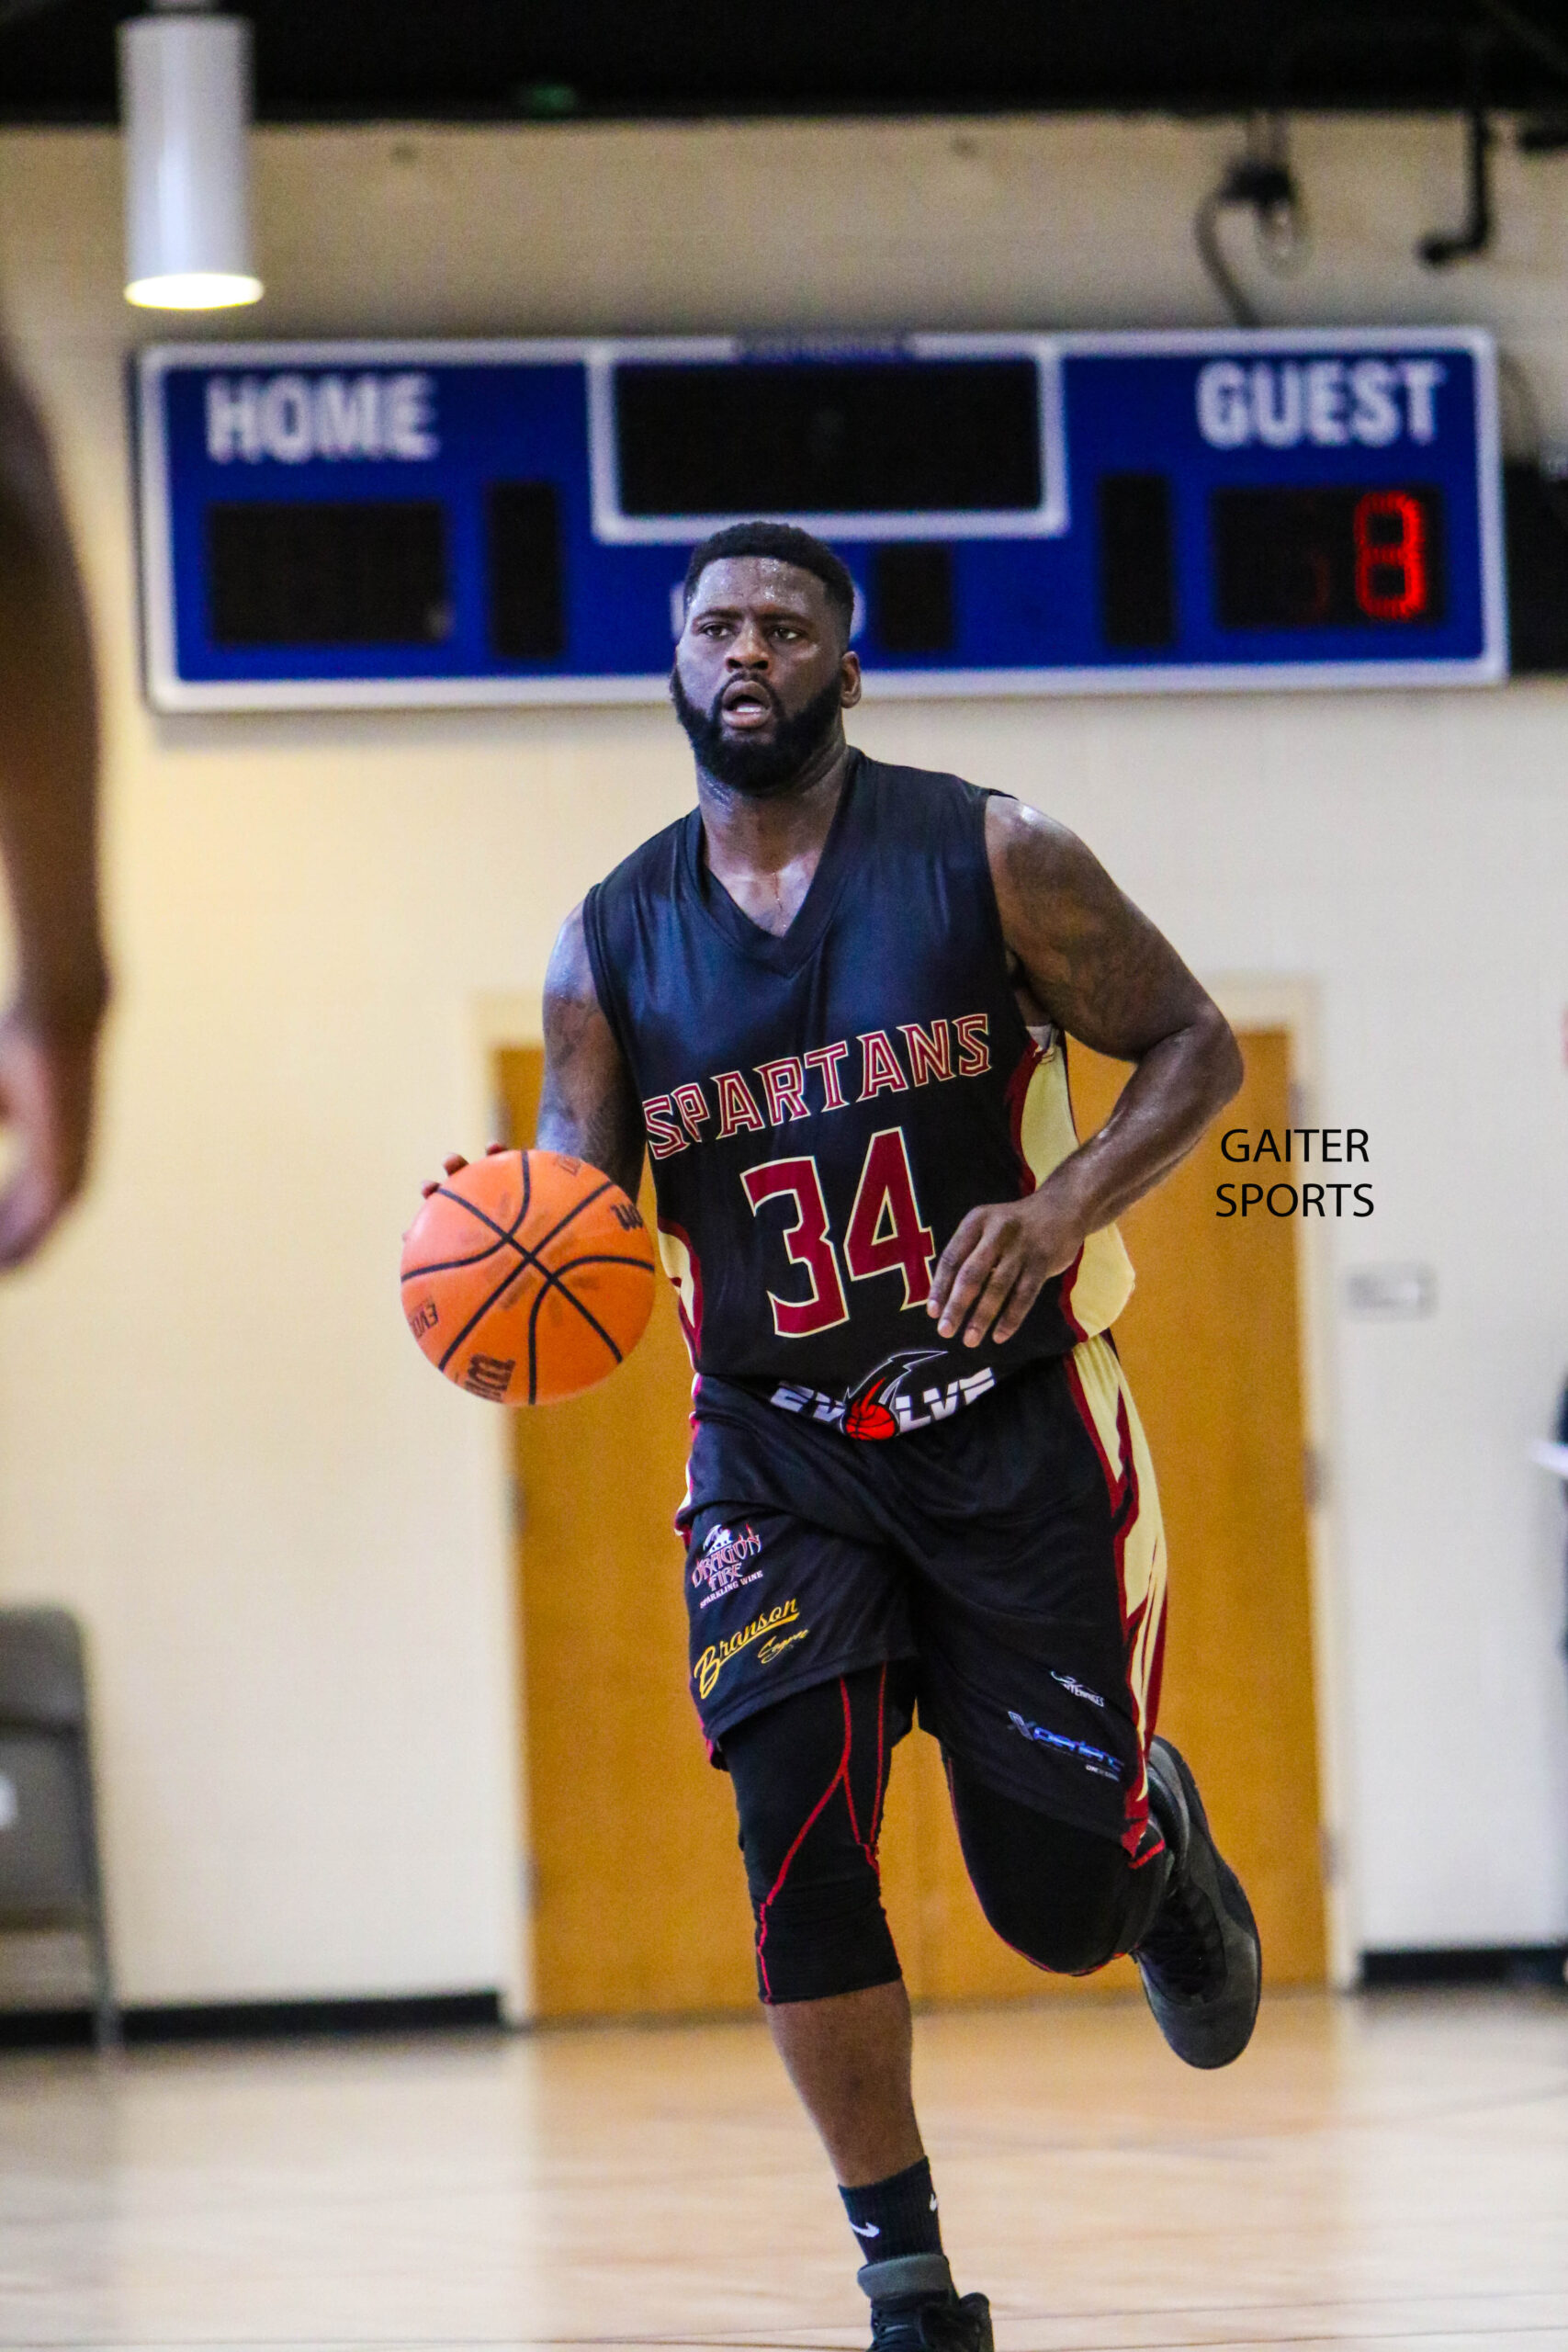 2019 Celebrity Basketball Game Georgia Spartans 130 Parysh Munroe